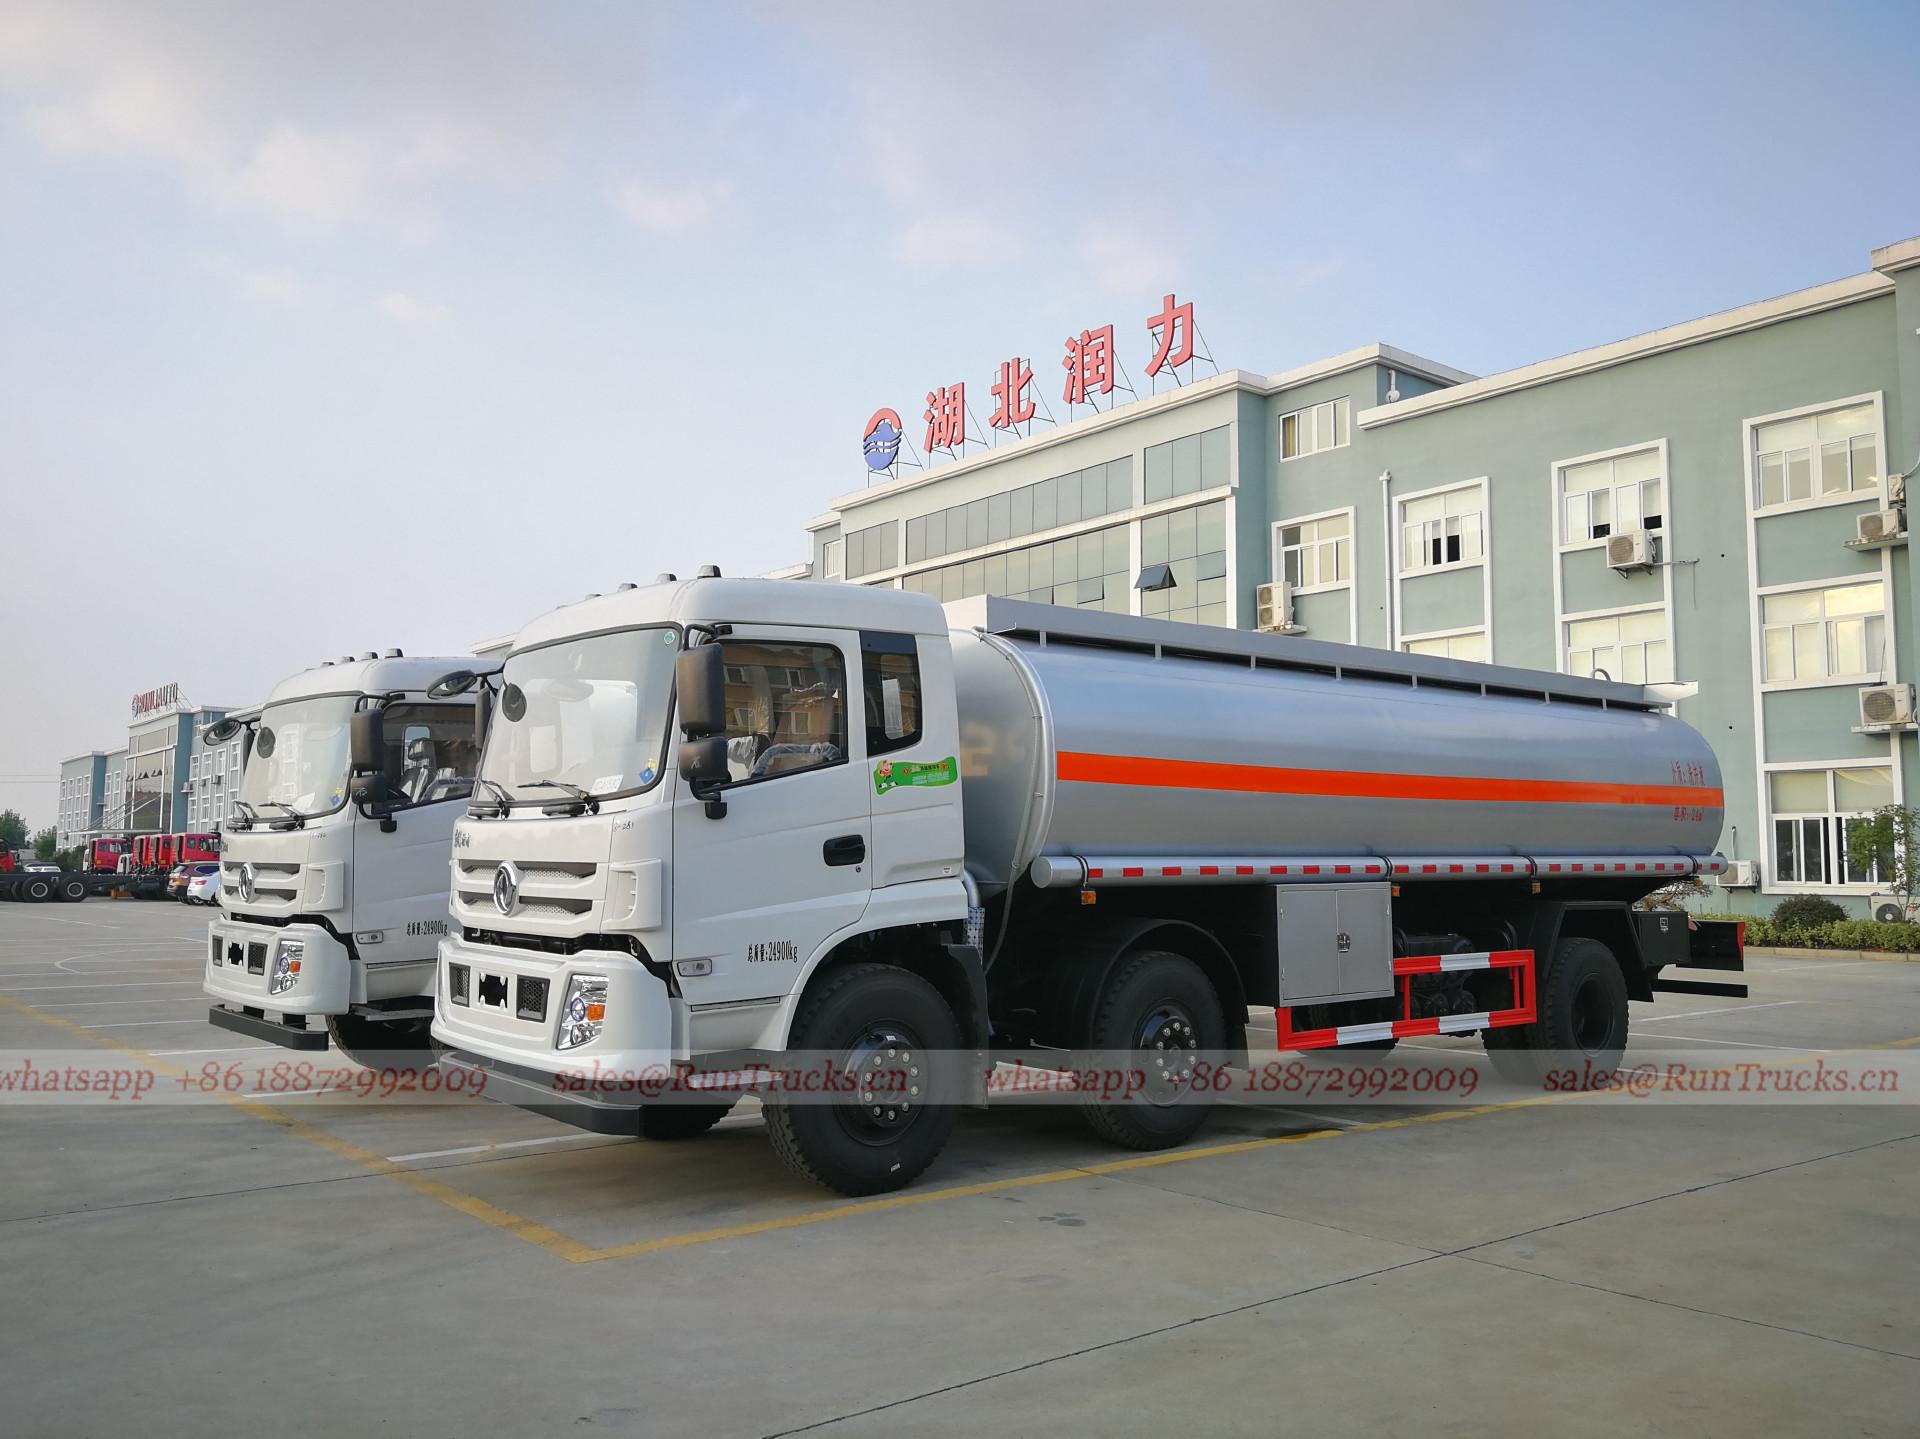 Cina Dongfeng 24 cbm liquido di approvvigionamento del veico